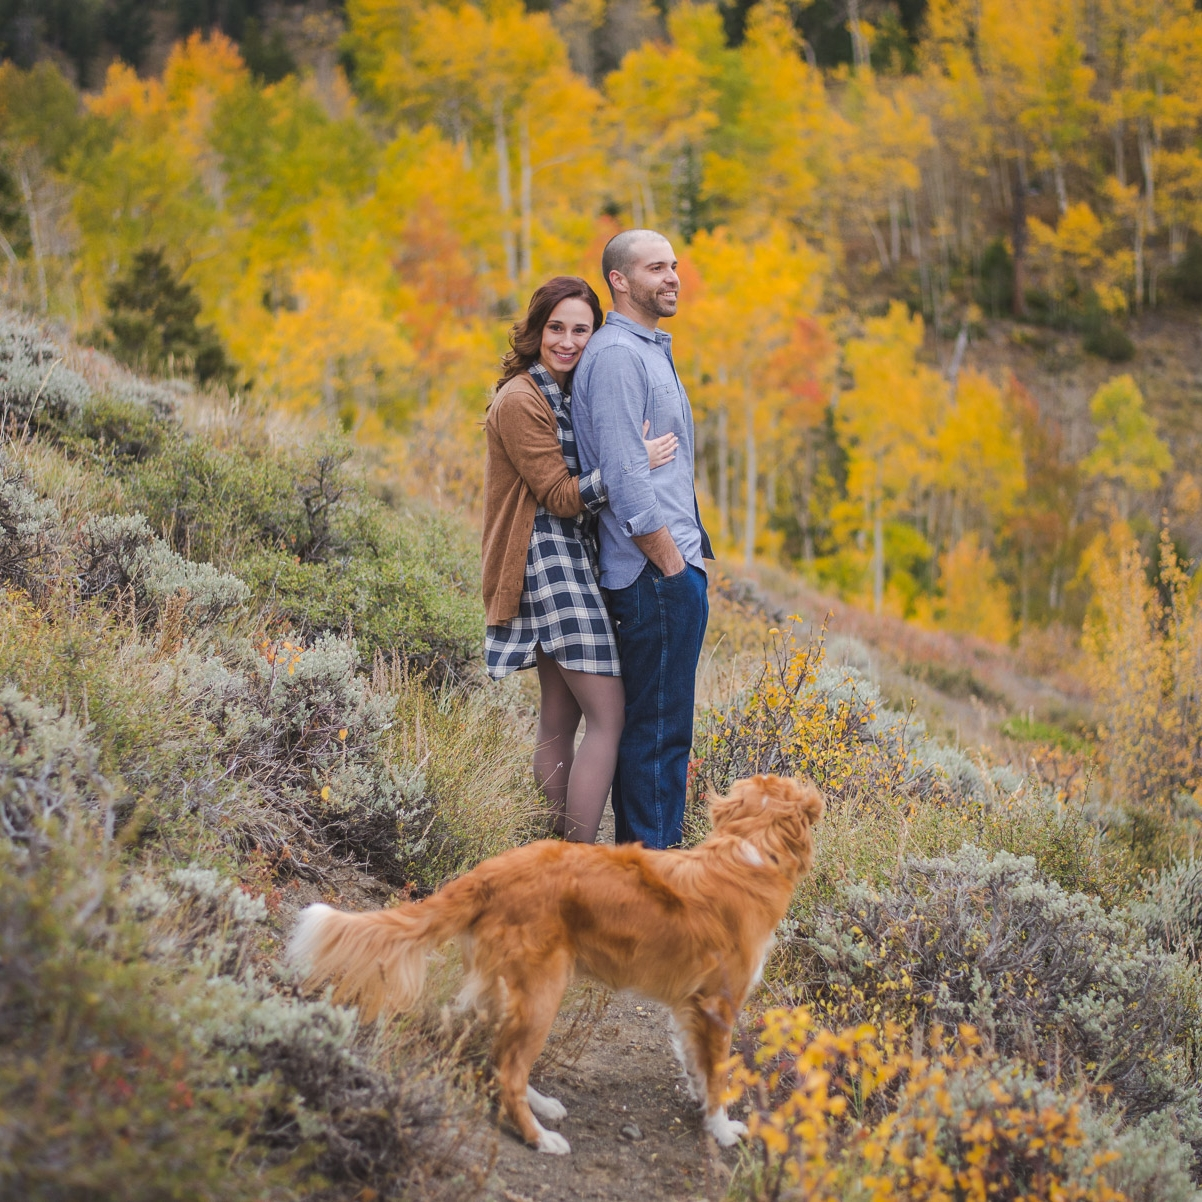 autumn engagement photos in colorado mountains